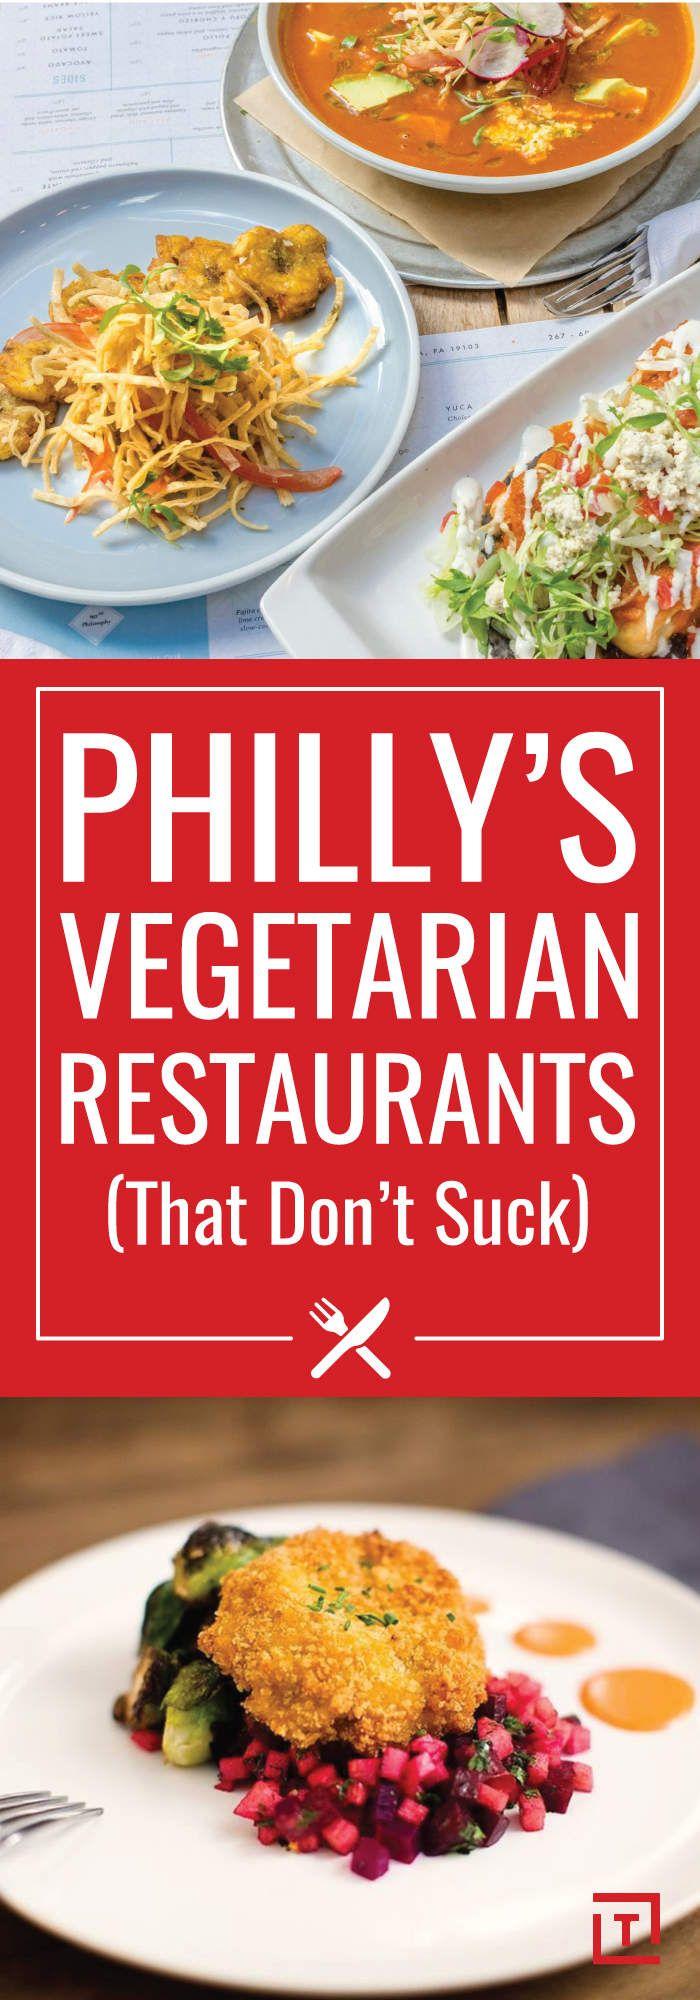 Philly's Vegetarian Restaurants That Don't Suck